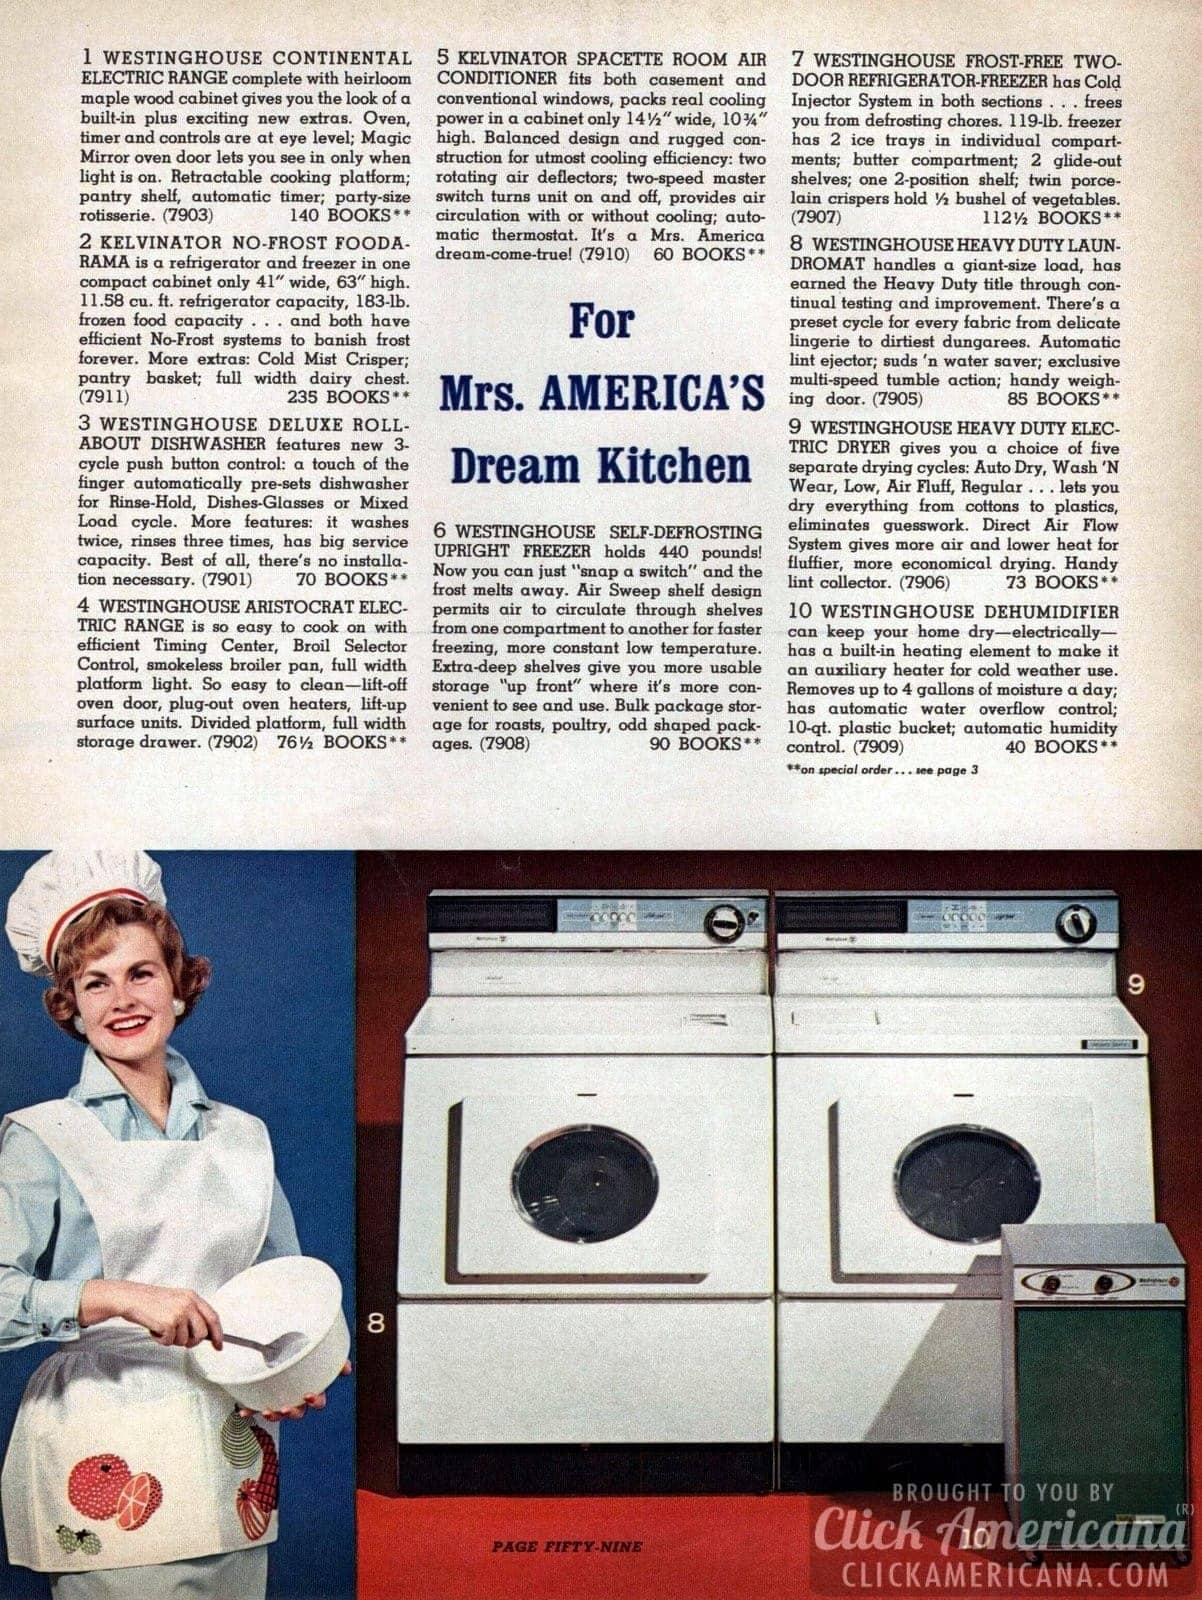 For Mrs America's Dream Kitchen: Appliances - range, dishwasher, air conditioner